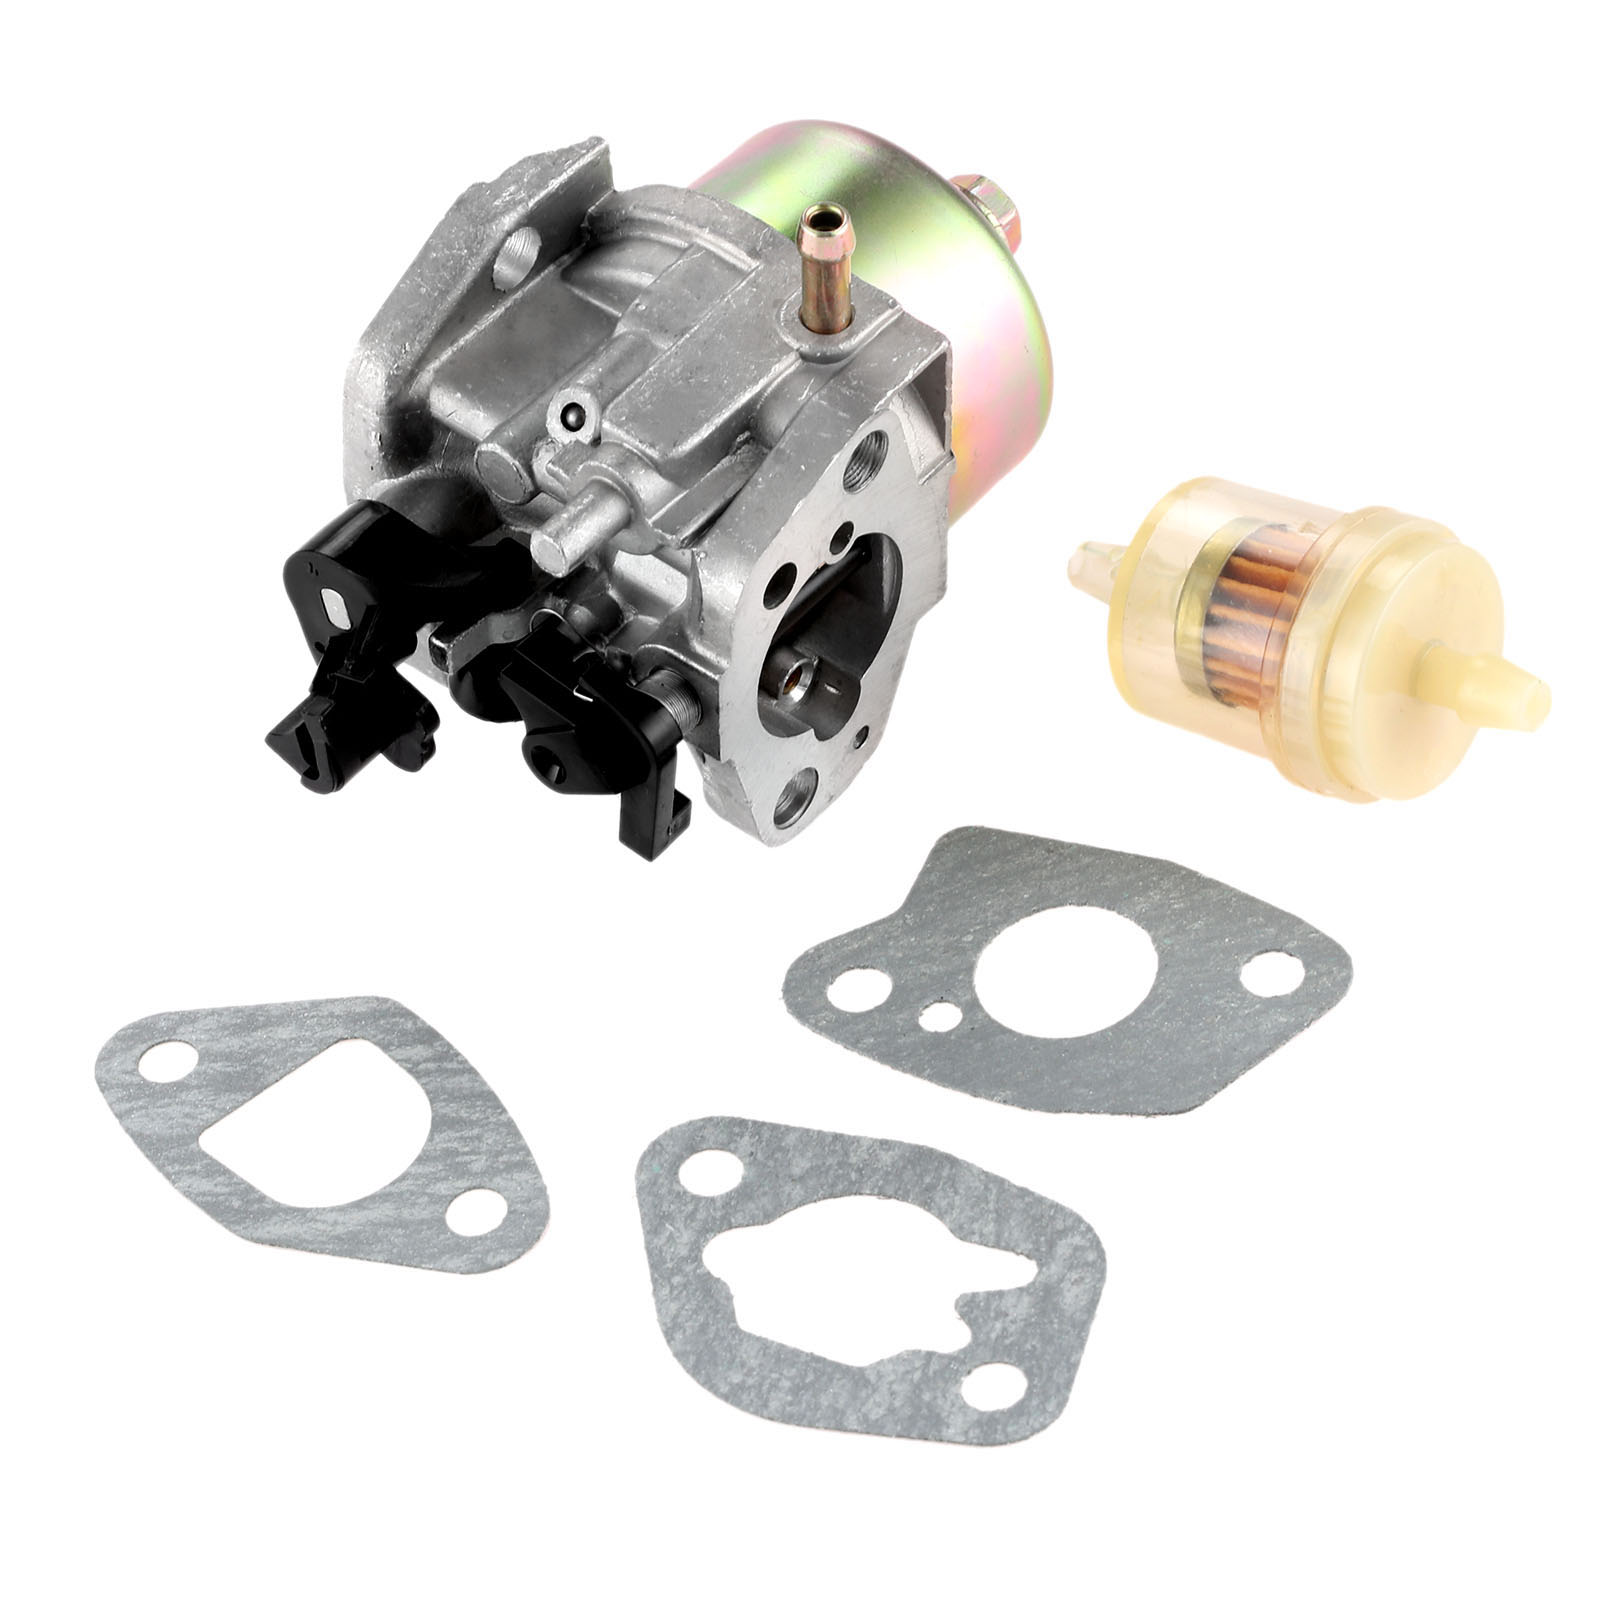 medium resolution of dreld carburetor with carburetor gasket fuel filter for mtd cub cadet troy bilt lawn mower engines